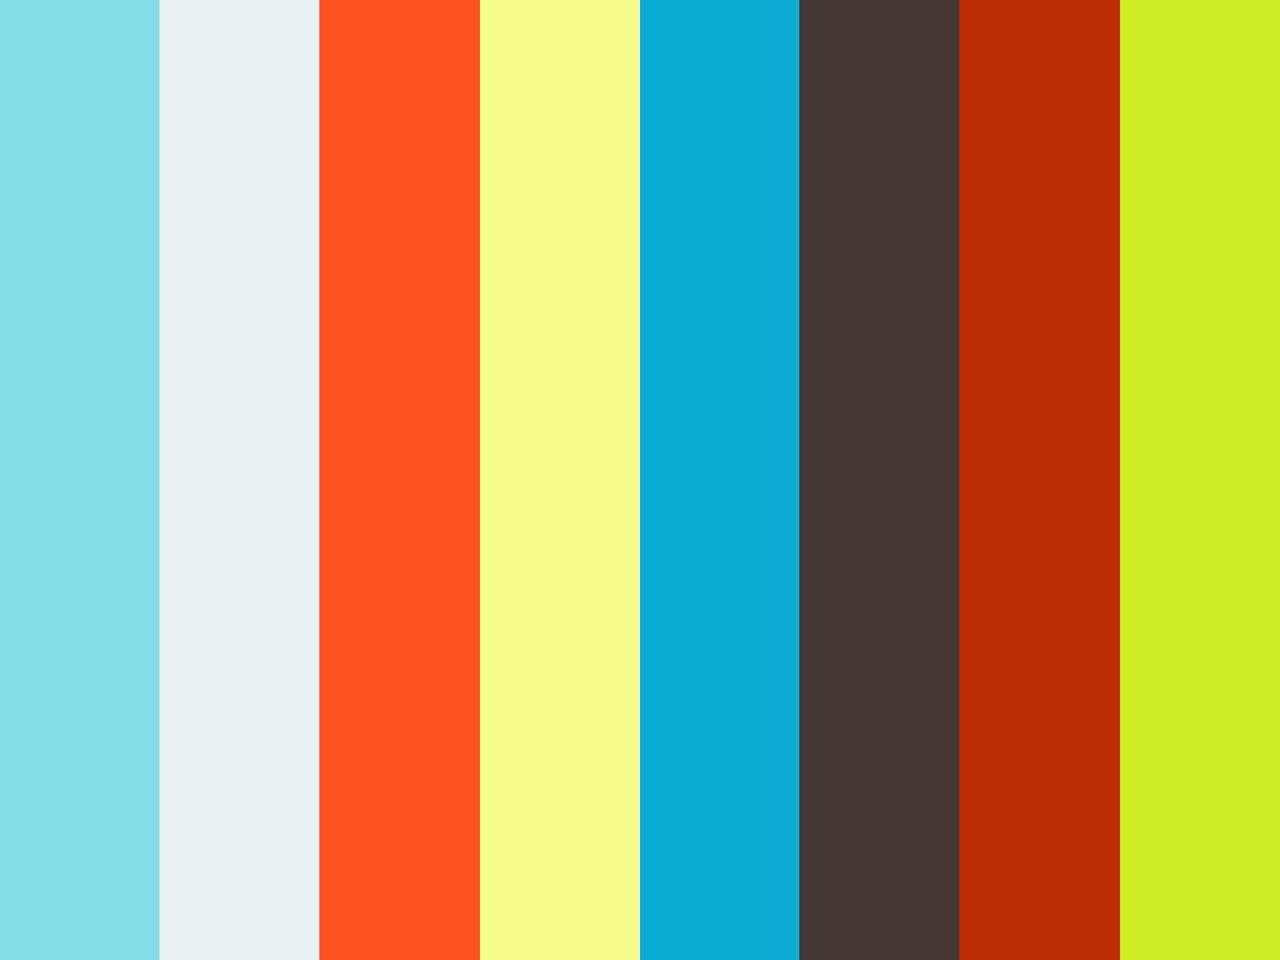 003055 - SNTV - Akabeats goes classic